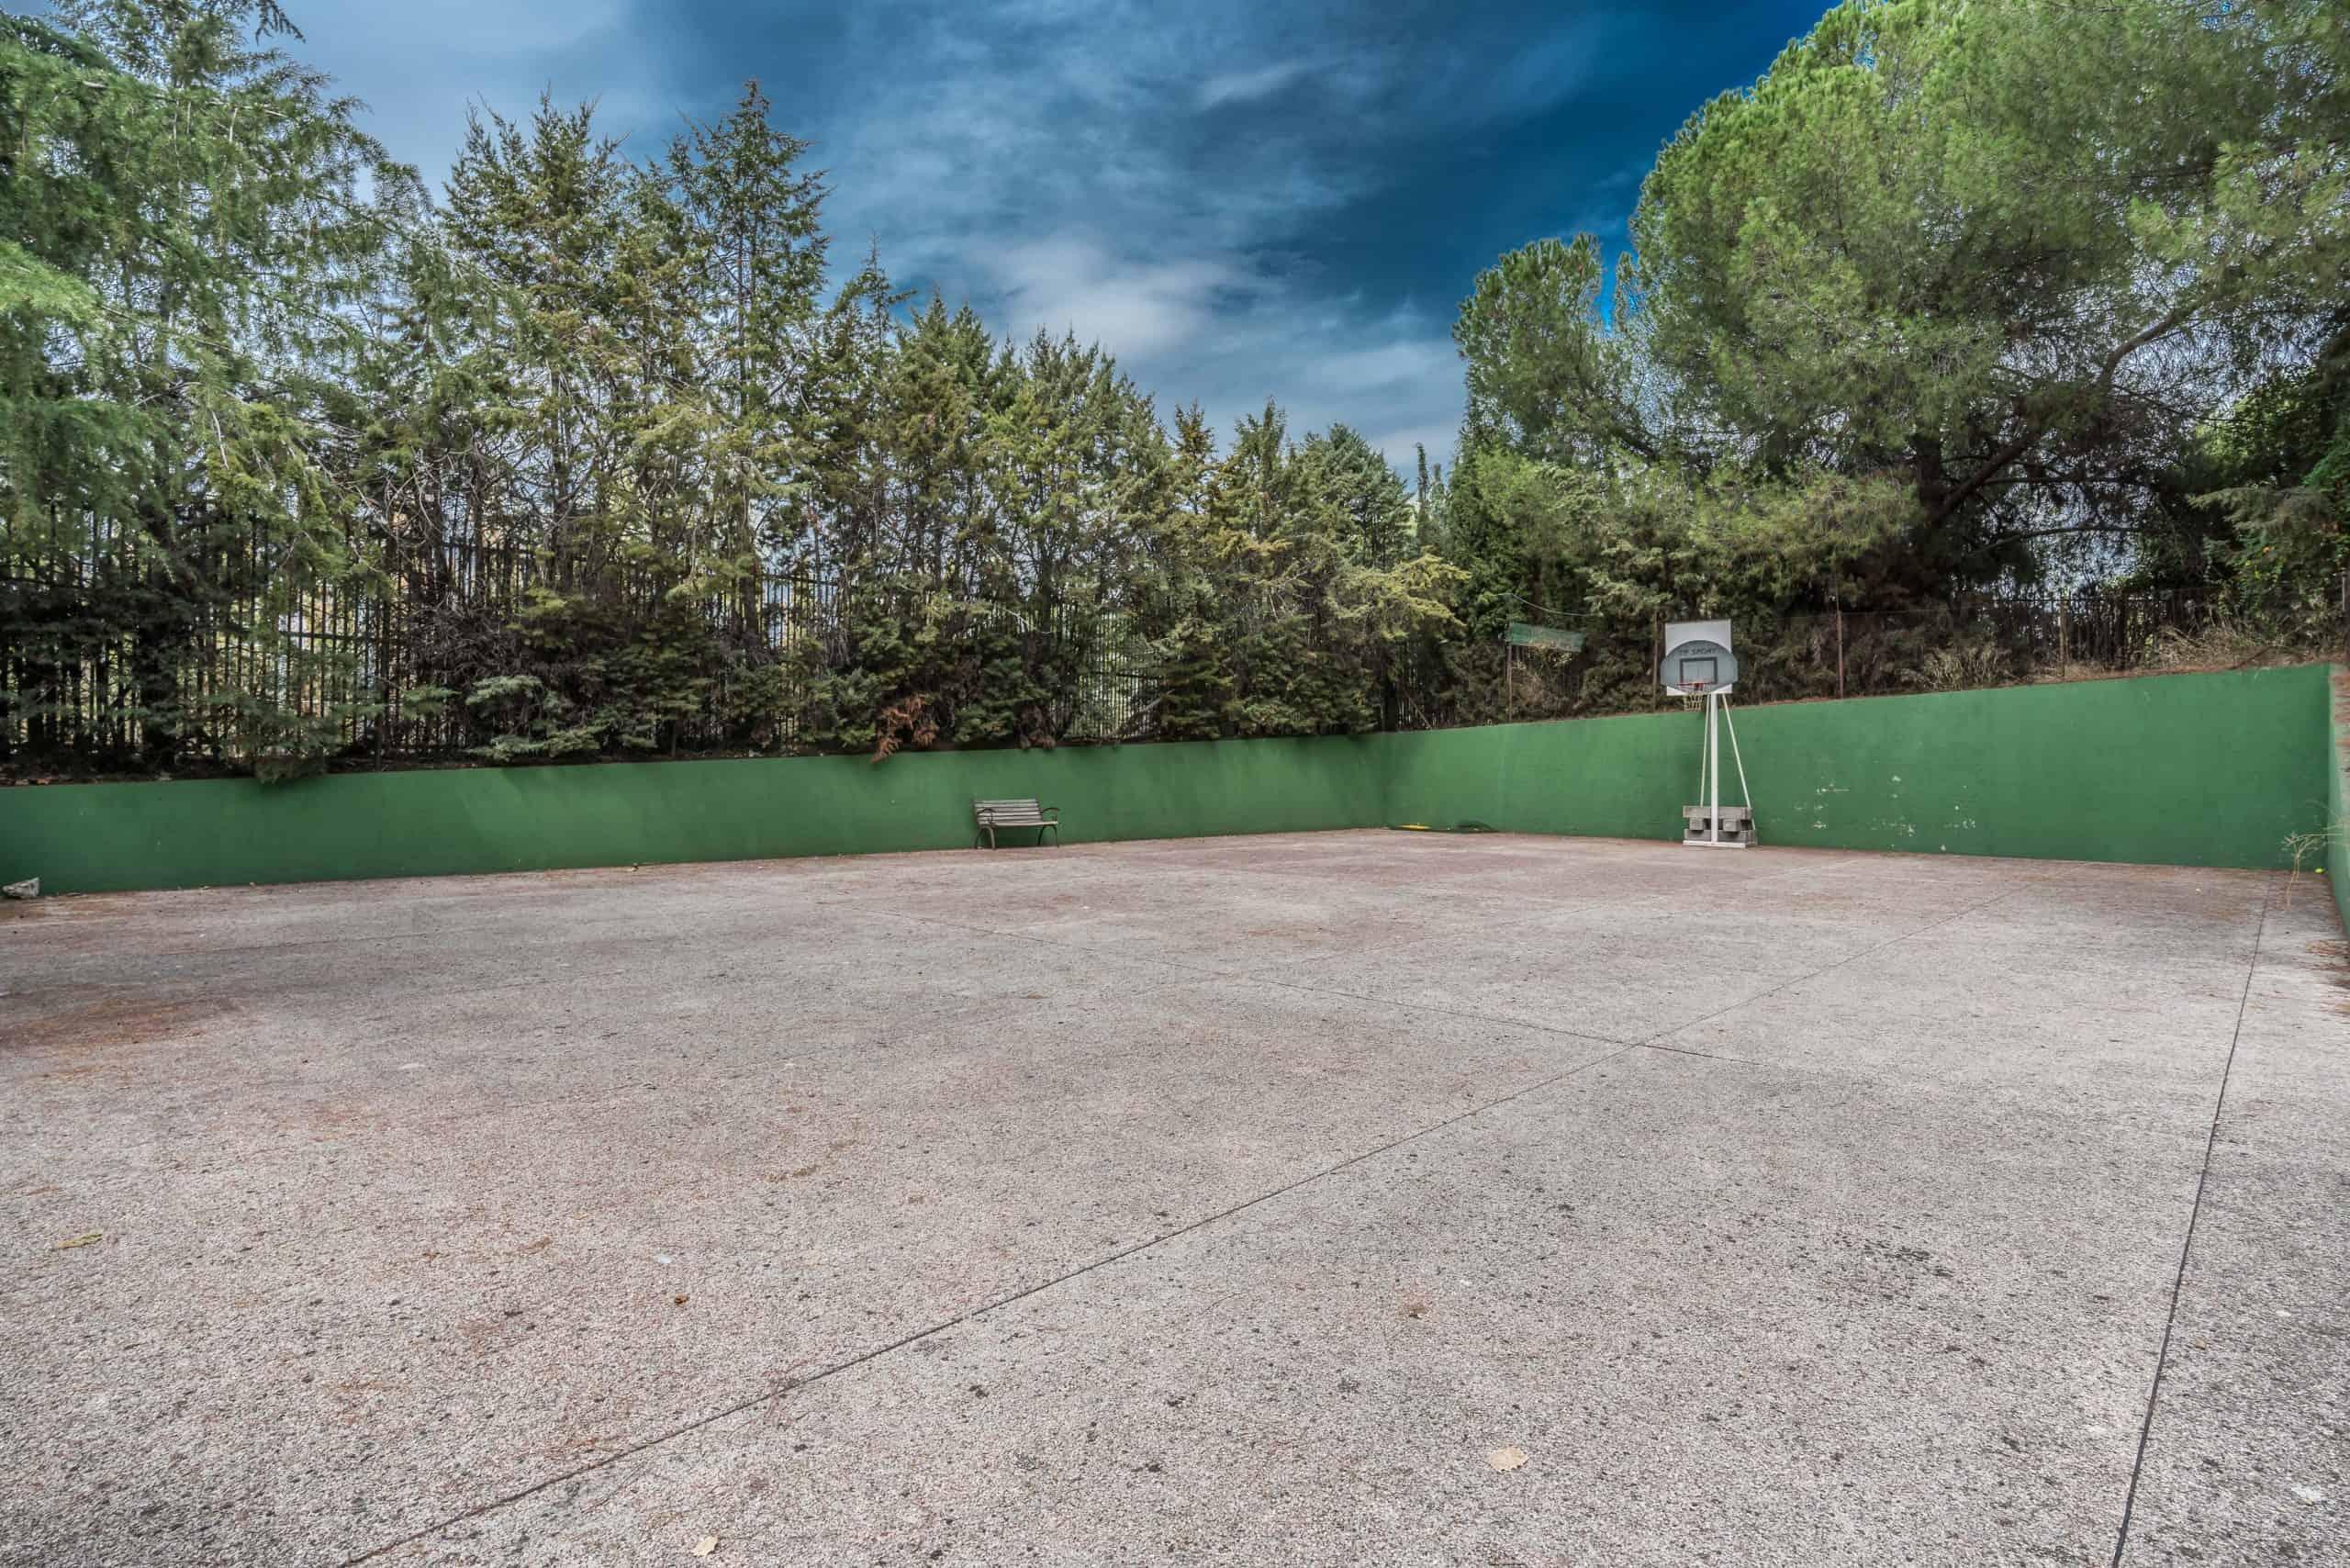 Agencia Inmobiliaria de Madrid-FUTUROCASA-Zona ARGANZUELA-EMBAJADORES-LEGAZPI -calle Embajadores- baño 170